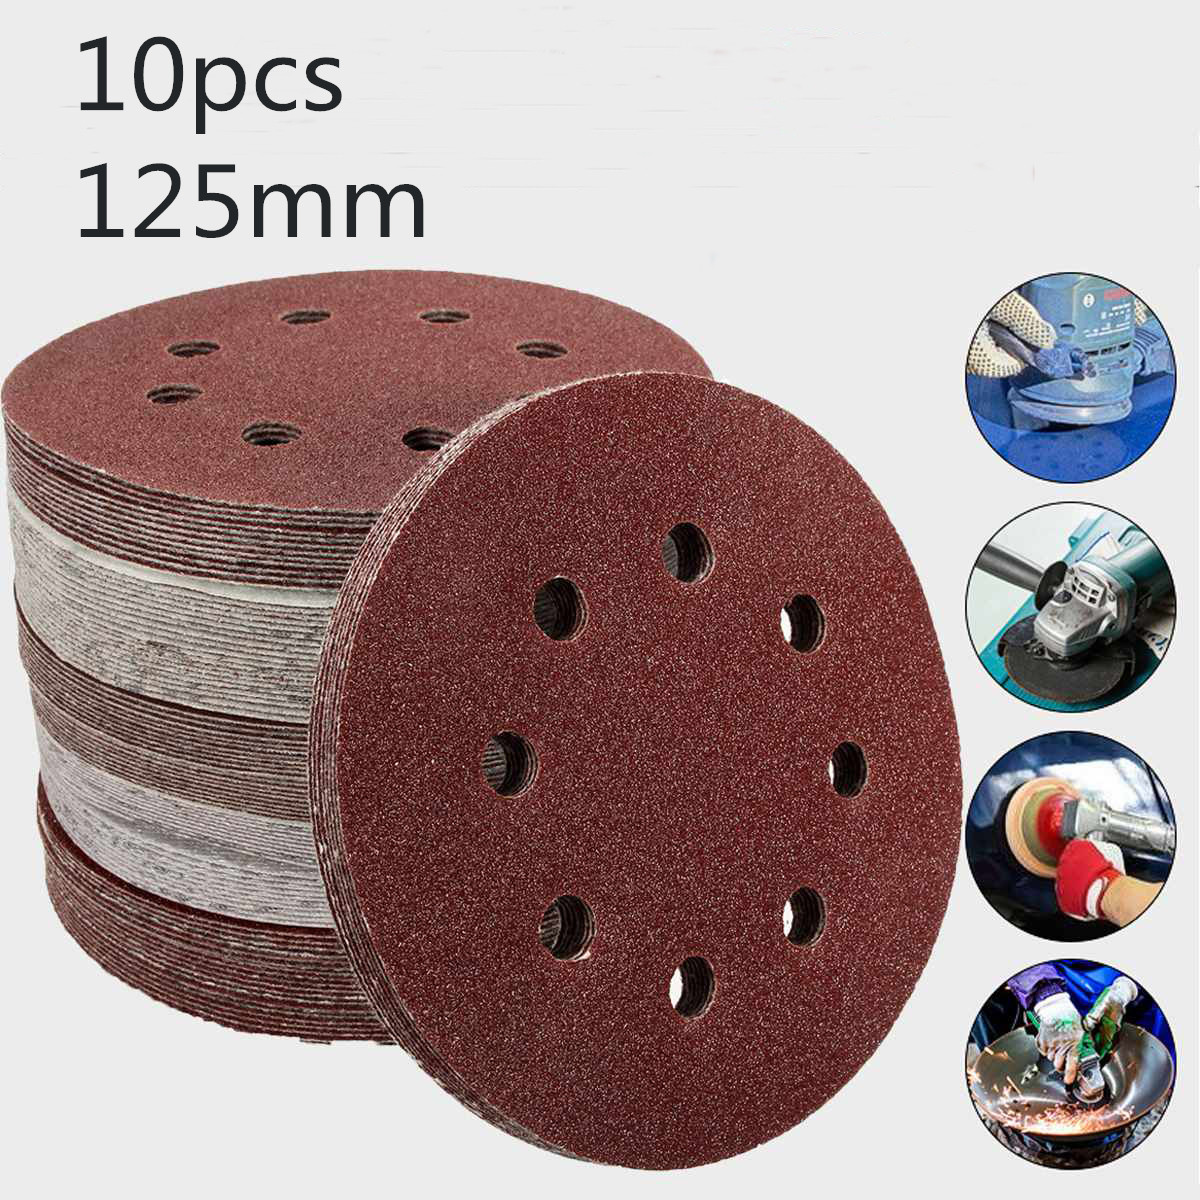 10Pcs 125mm Grit Round Shape Sanding Discs Buffing Sheet Sandpaper 8 Hole Polishing Pad Sander 80/180/240/320/1000/1500/2000